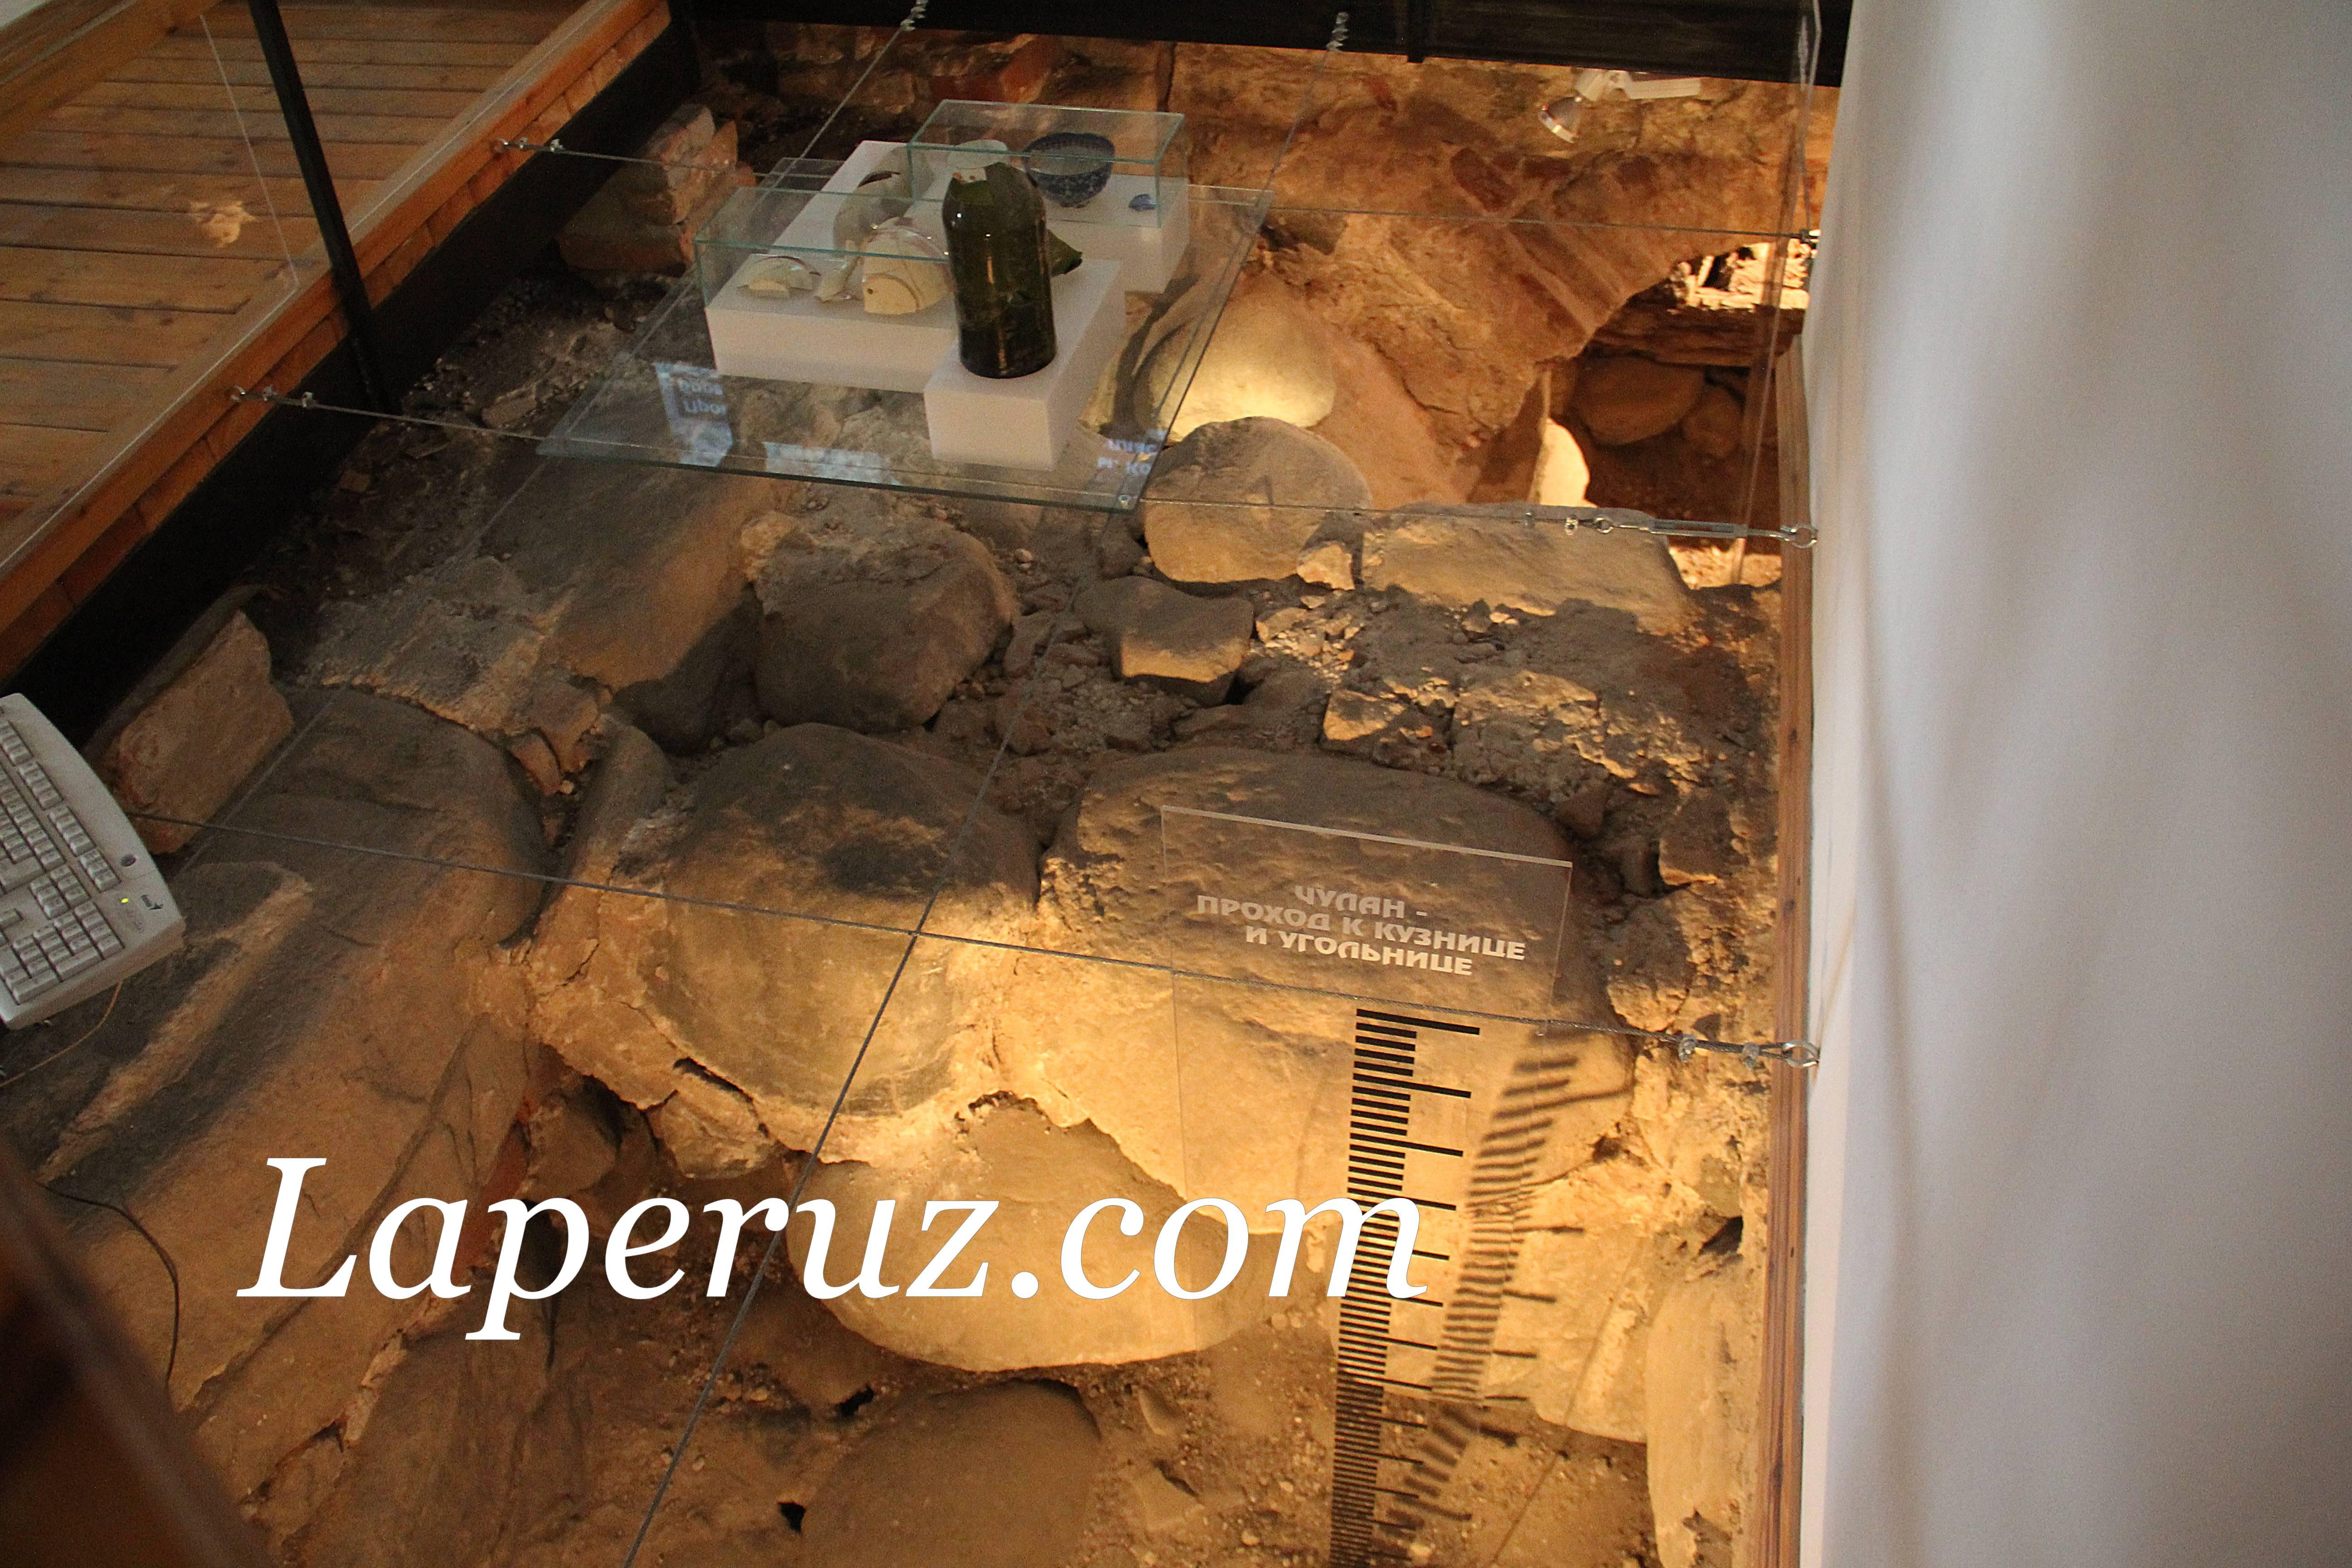 arheologicheskii_muzei_solovki_fundament_4